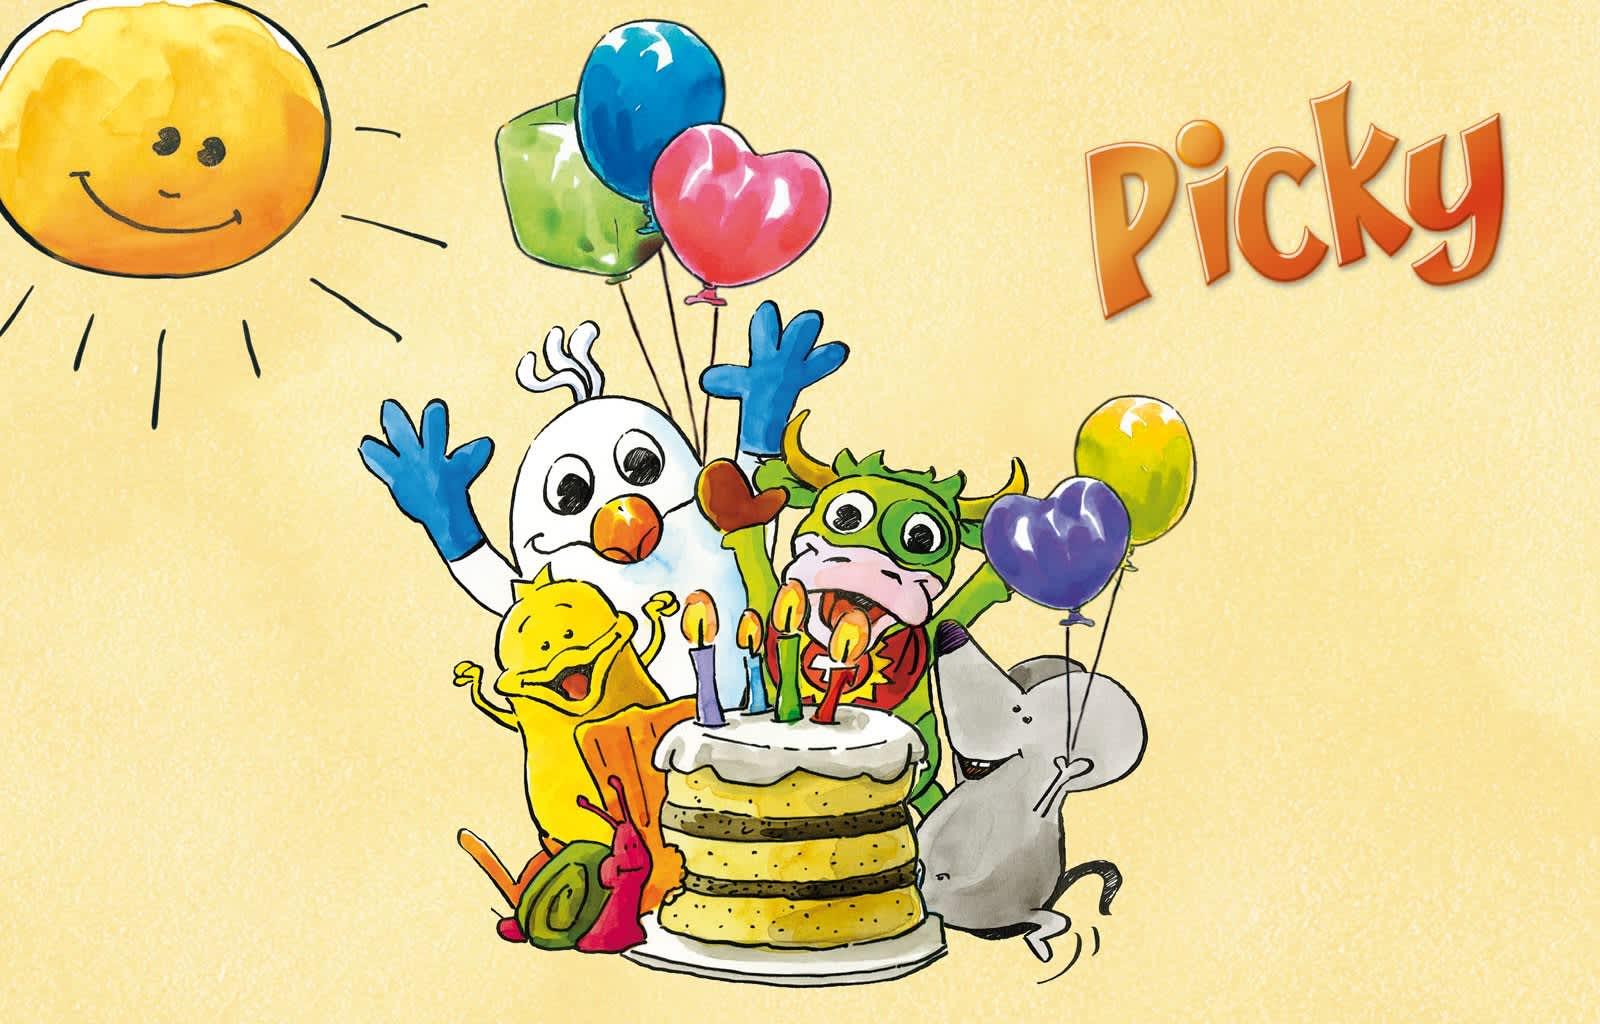 Picky, Geburtstagsfest, Geburtstag, Kinder, Kinderparty